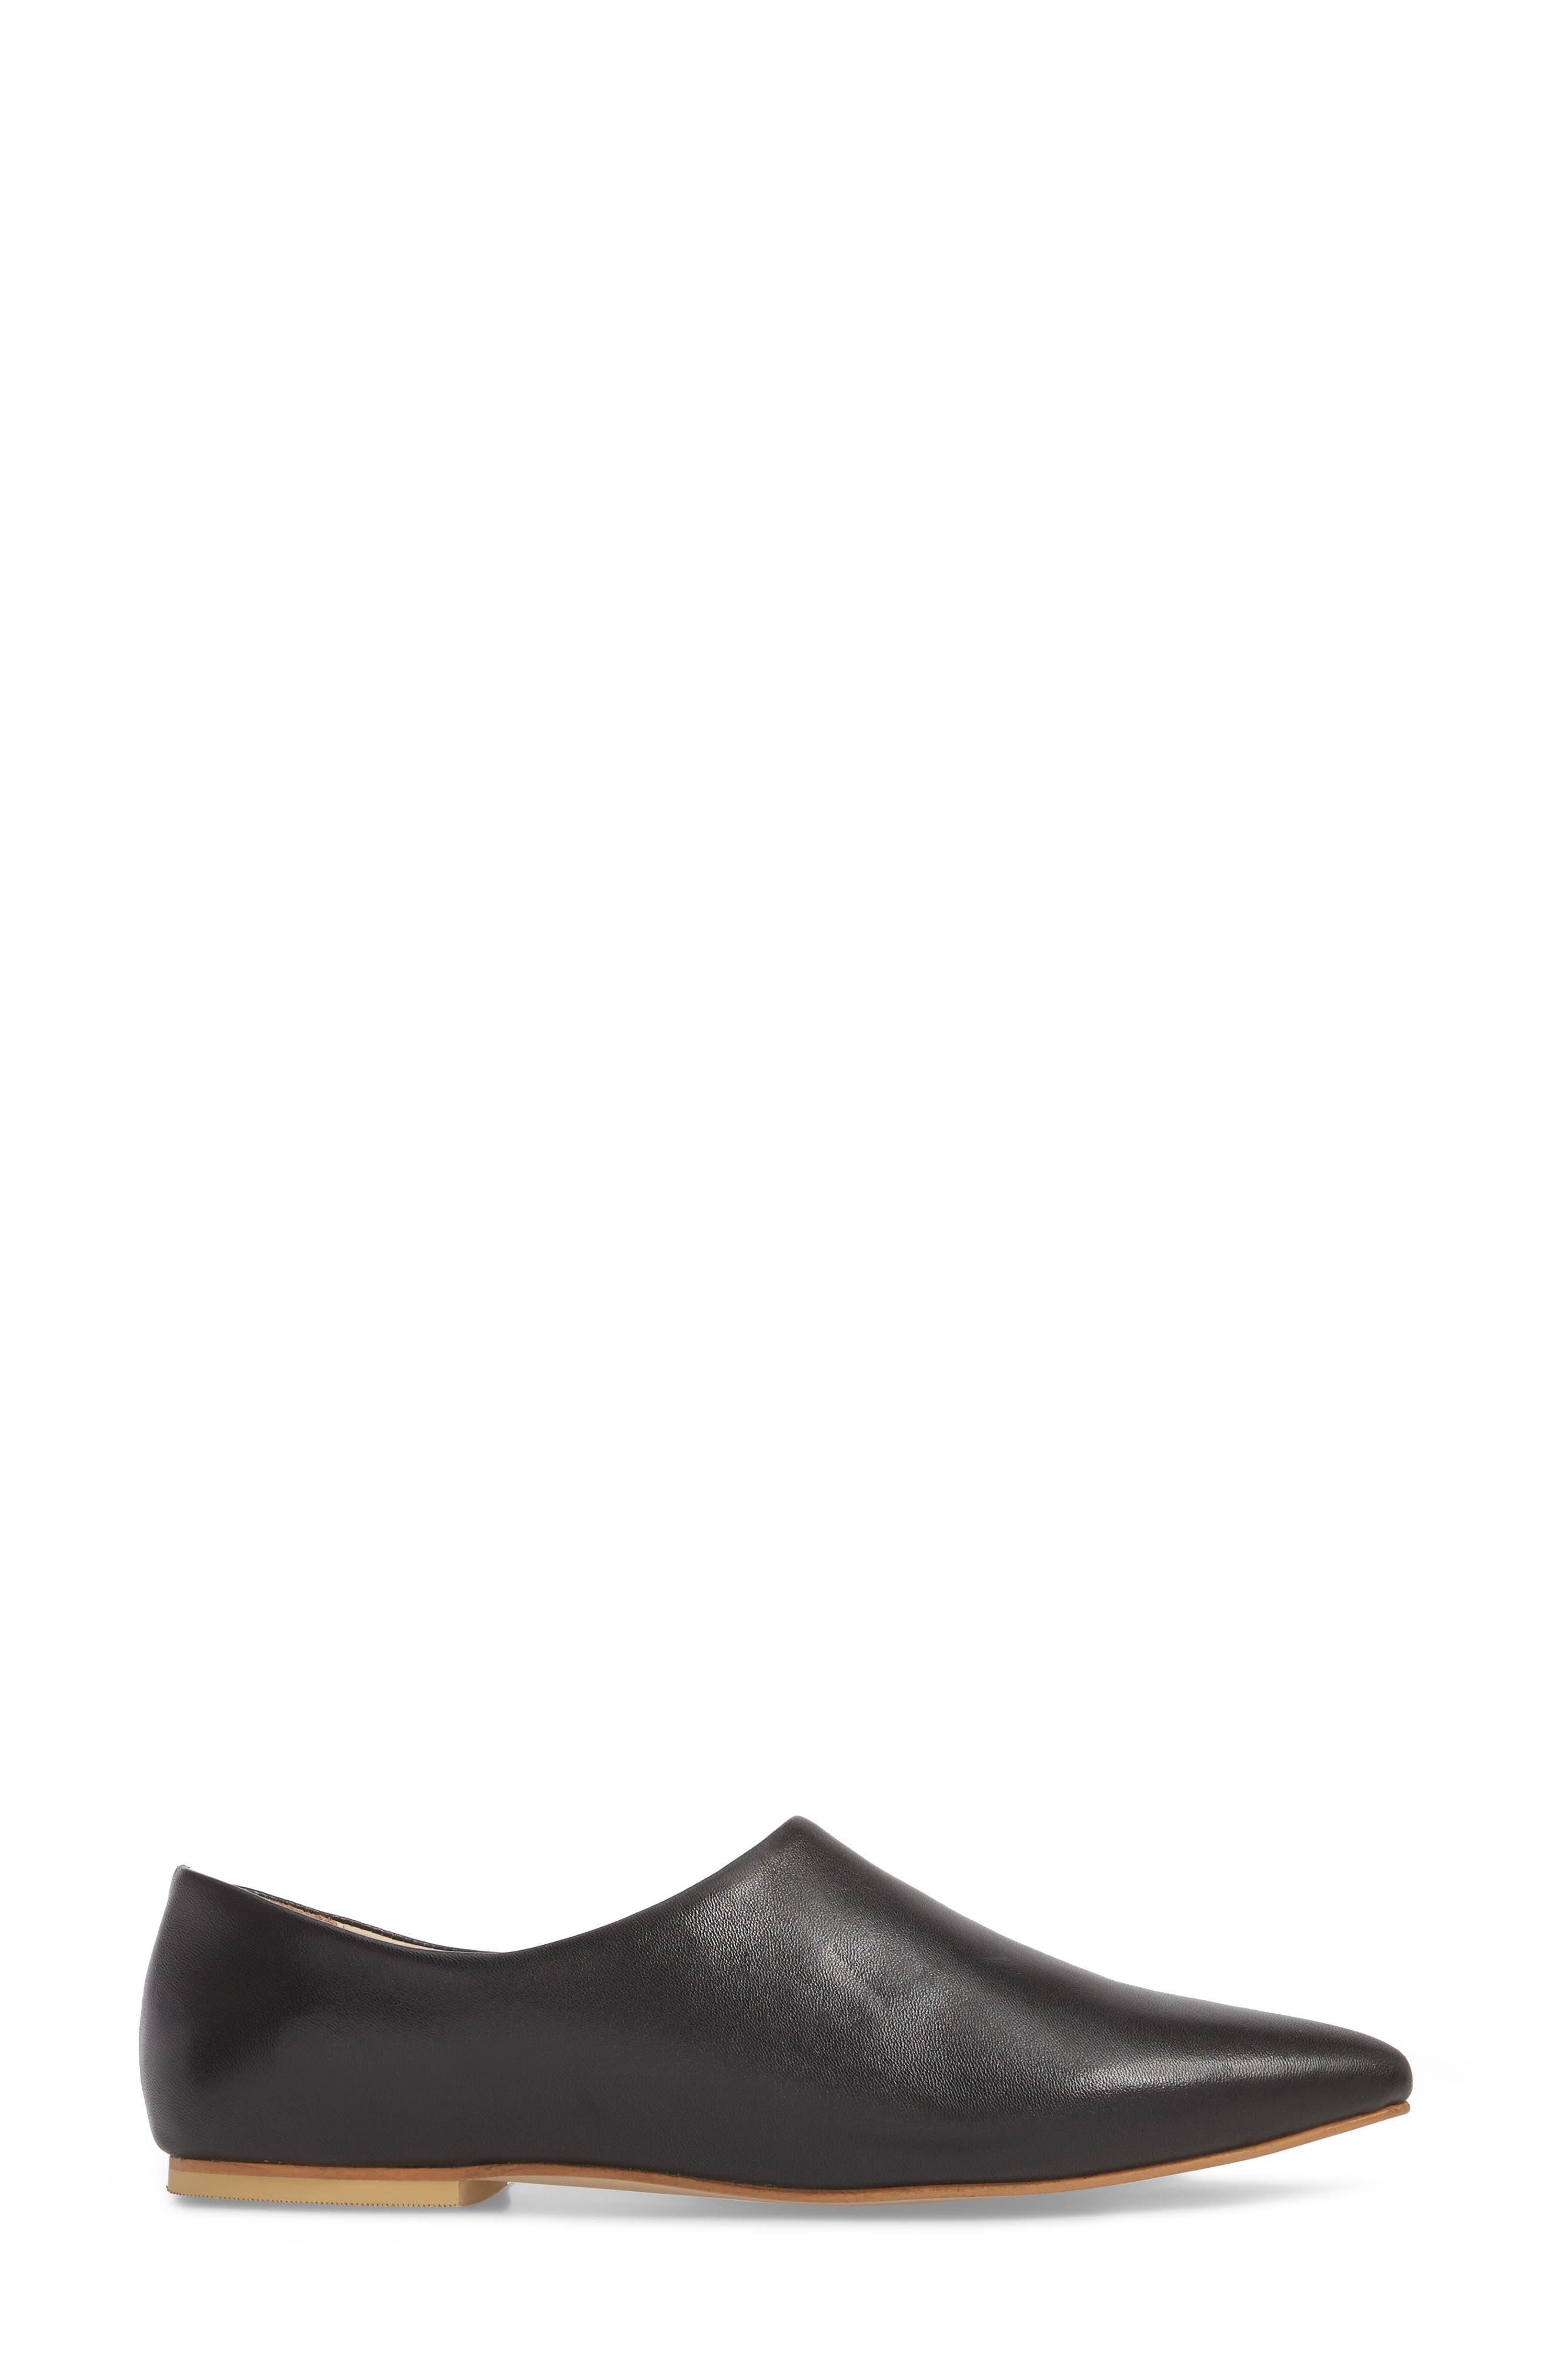 Dolce Flat,                             Alternate thumbnail 3, color,                             BLACK LEATHER